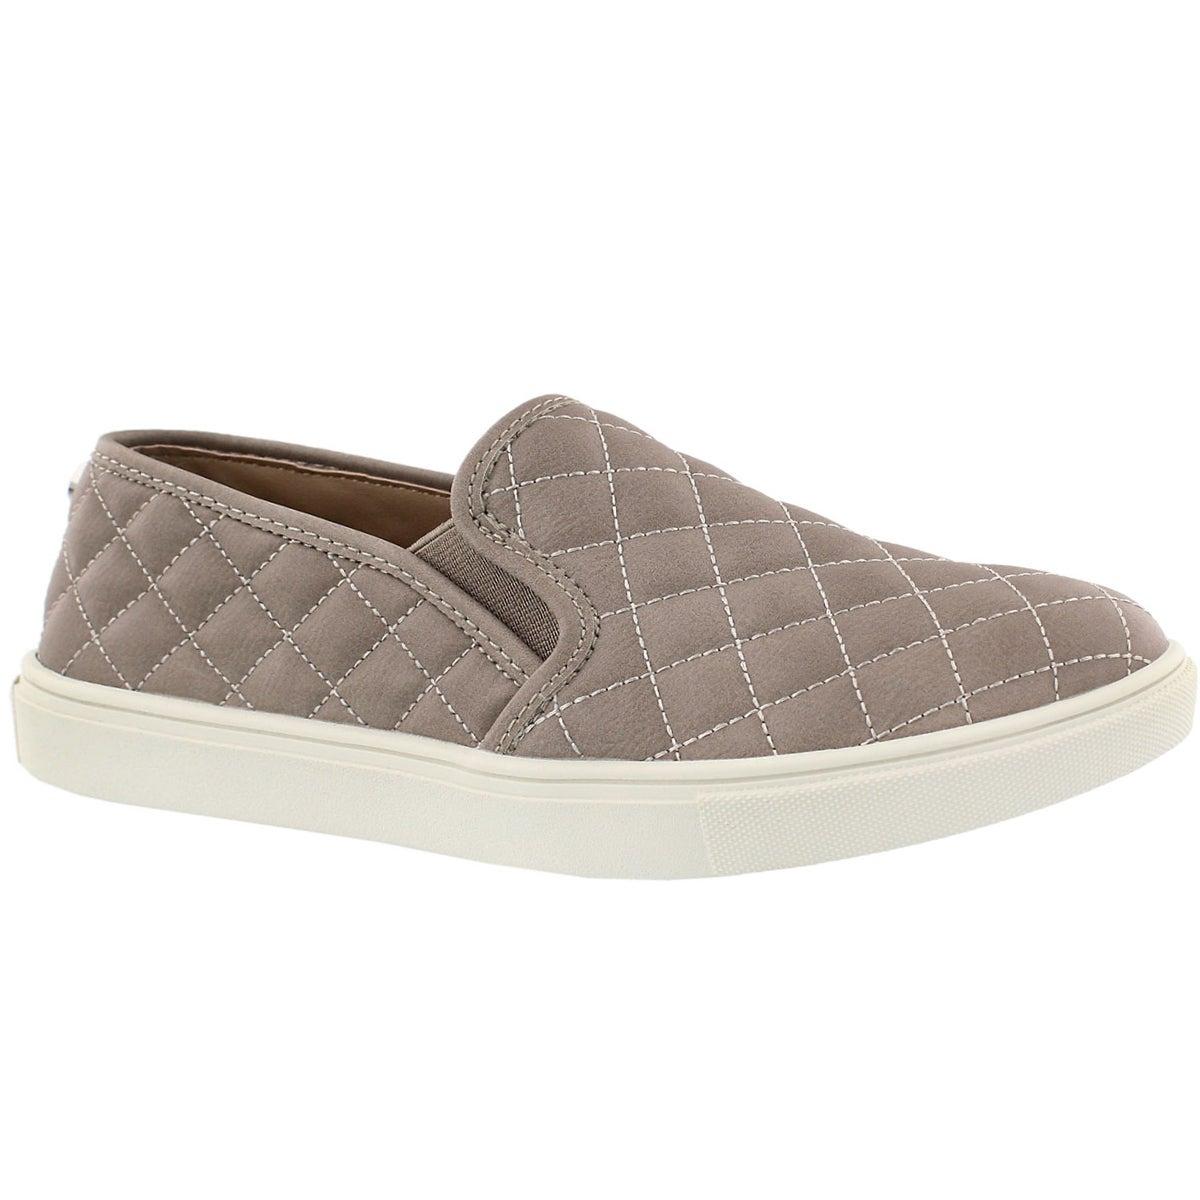 Women's ECENTRCQ grey casual slip on shoes